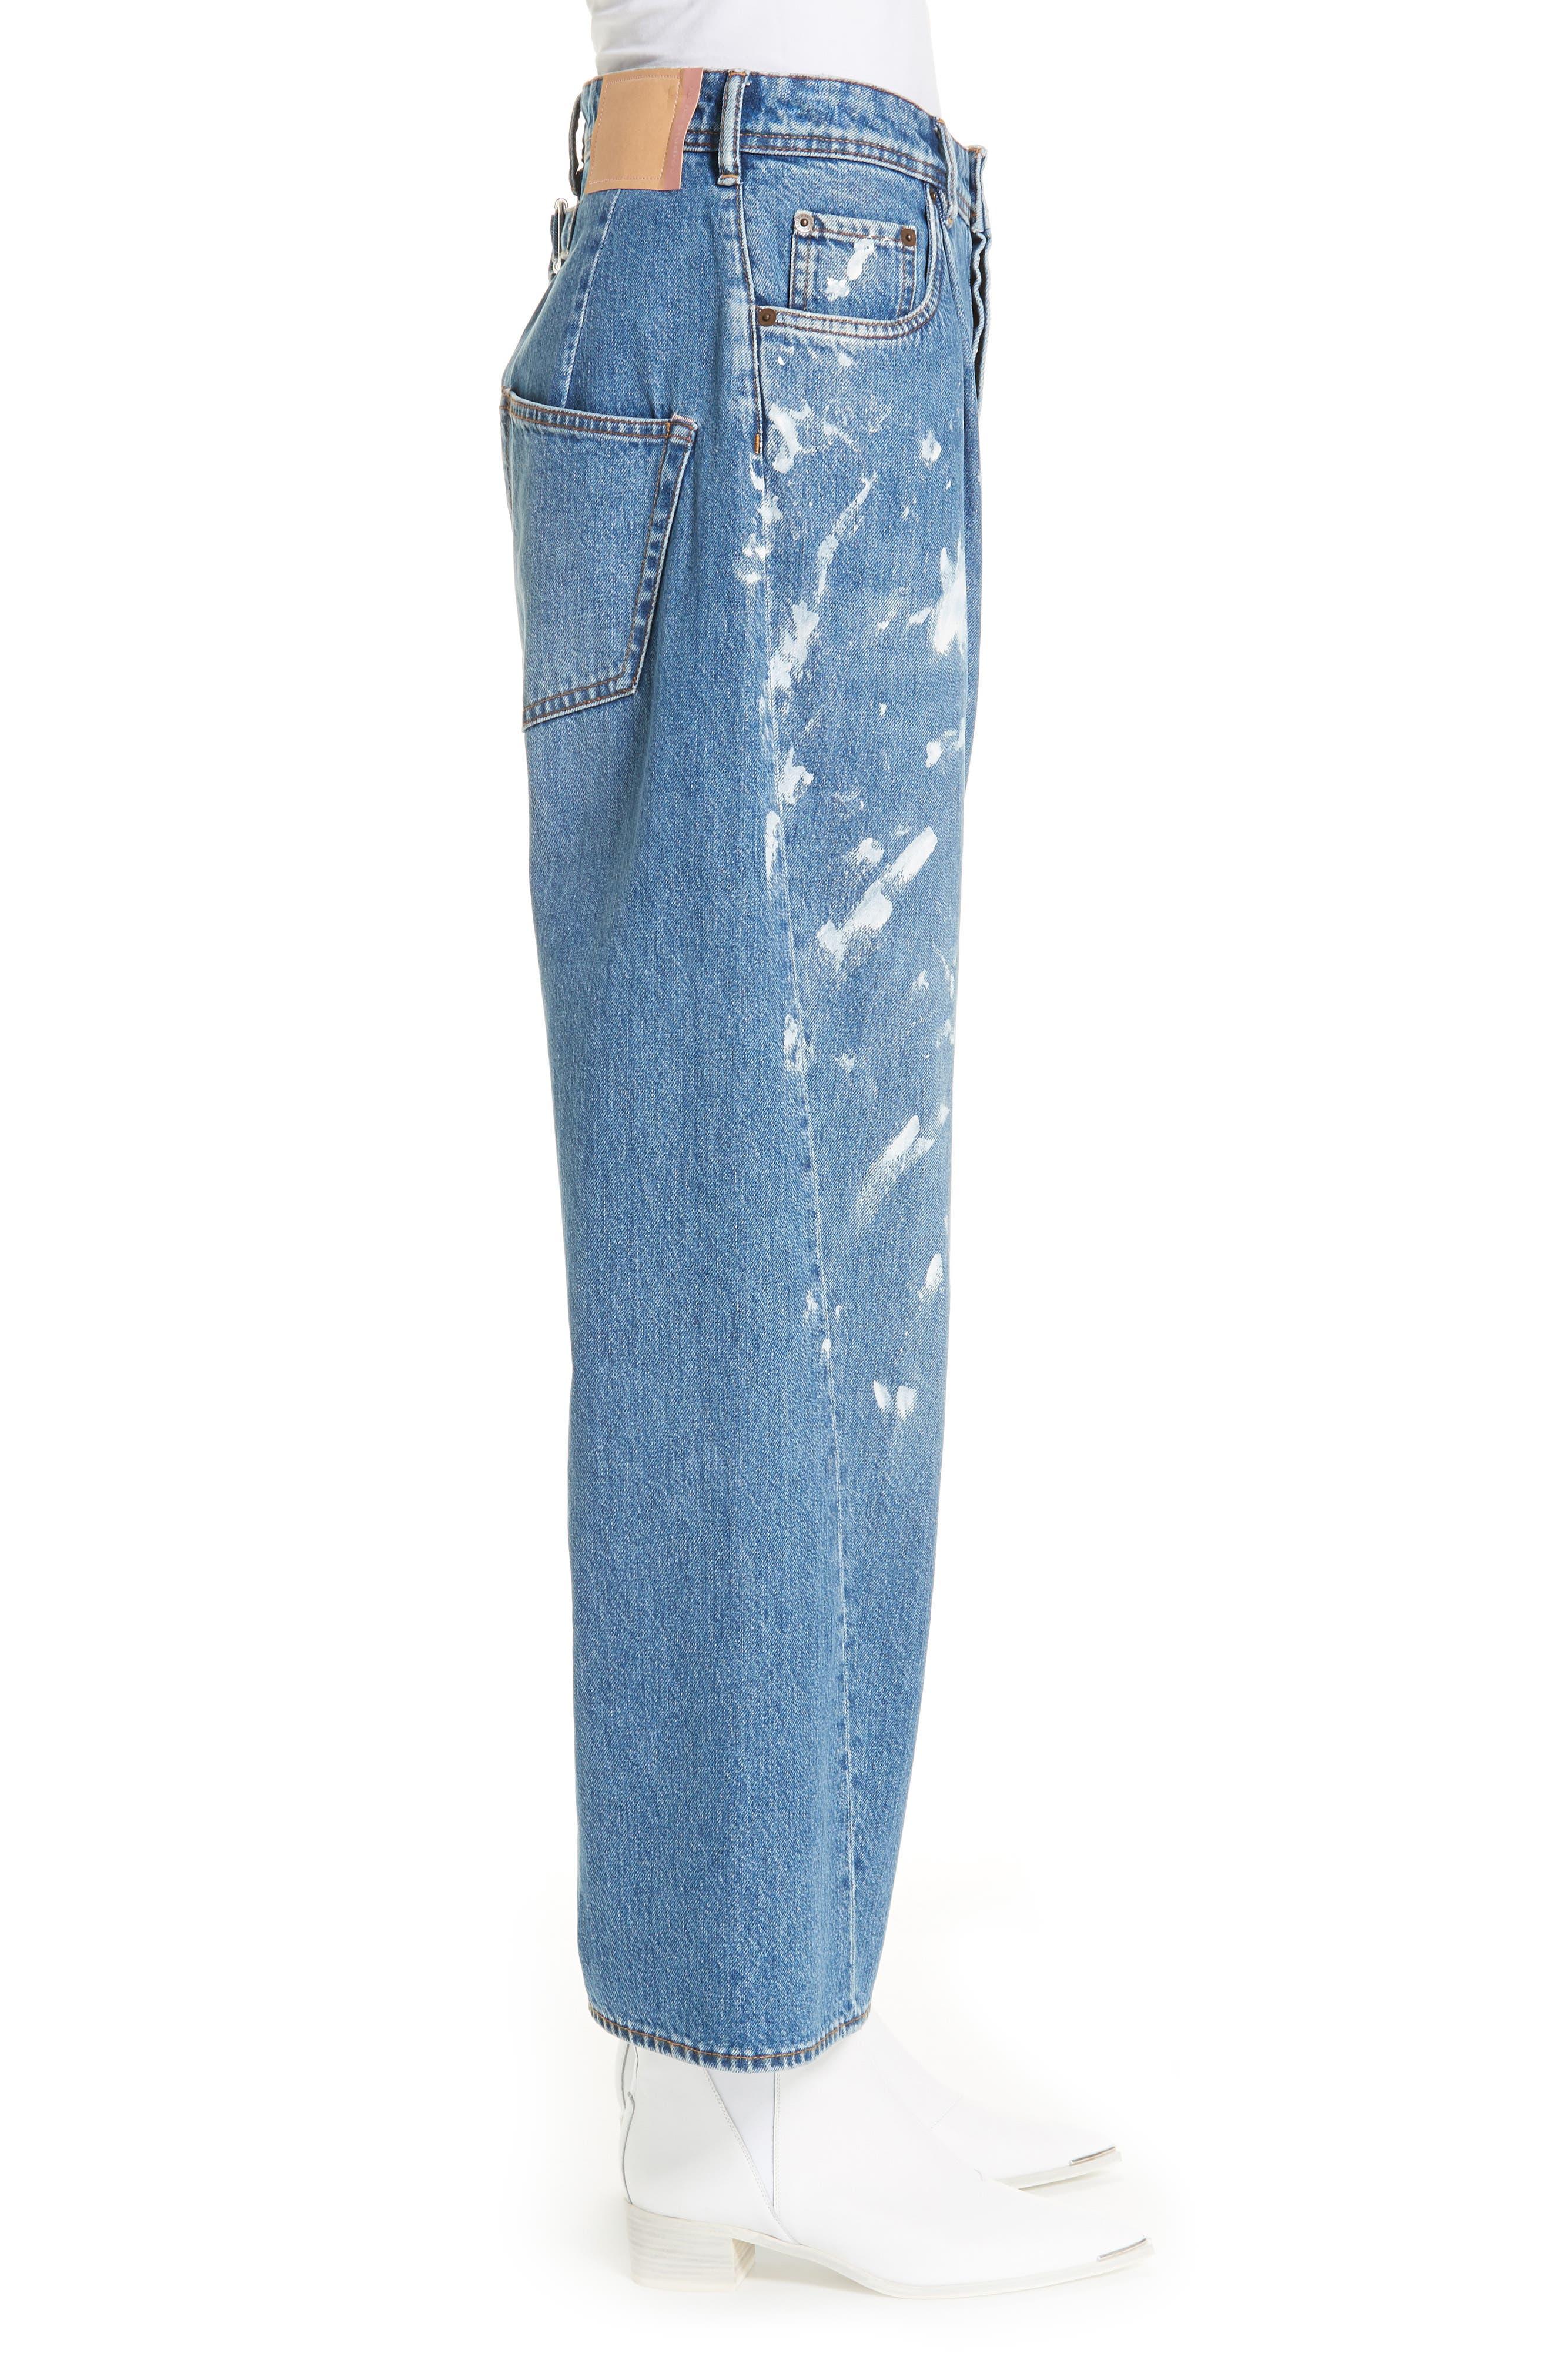 ACNE STUDIOS,                             Oversized Jeans,                             Alternate thumbnail 3, color,                             400